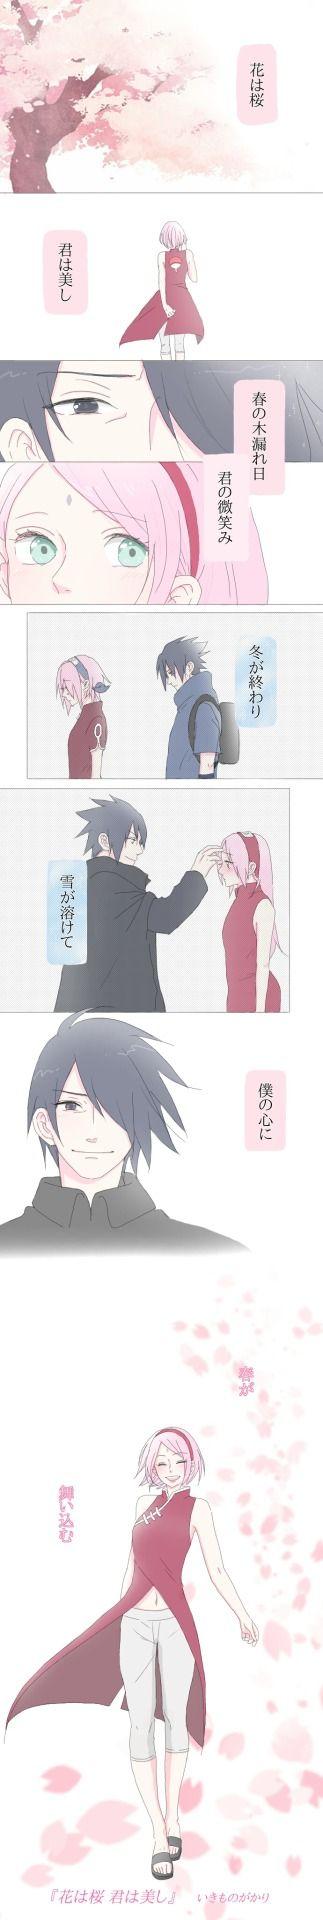 "sasusakuonly: ""花は桜 君は美し by だっつん (✅) ""『花は桜 君は美し/いきものがかり』 Twitterのアンケート結果から! いきものがかりの中でも特に好きな曲をサスサクで描かせていただきました~"" "" The flowers are Sakura (cherry blossoms) You are beautiful Spring light through the..."